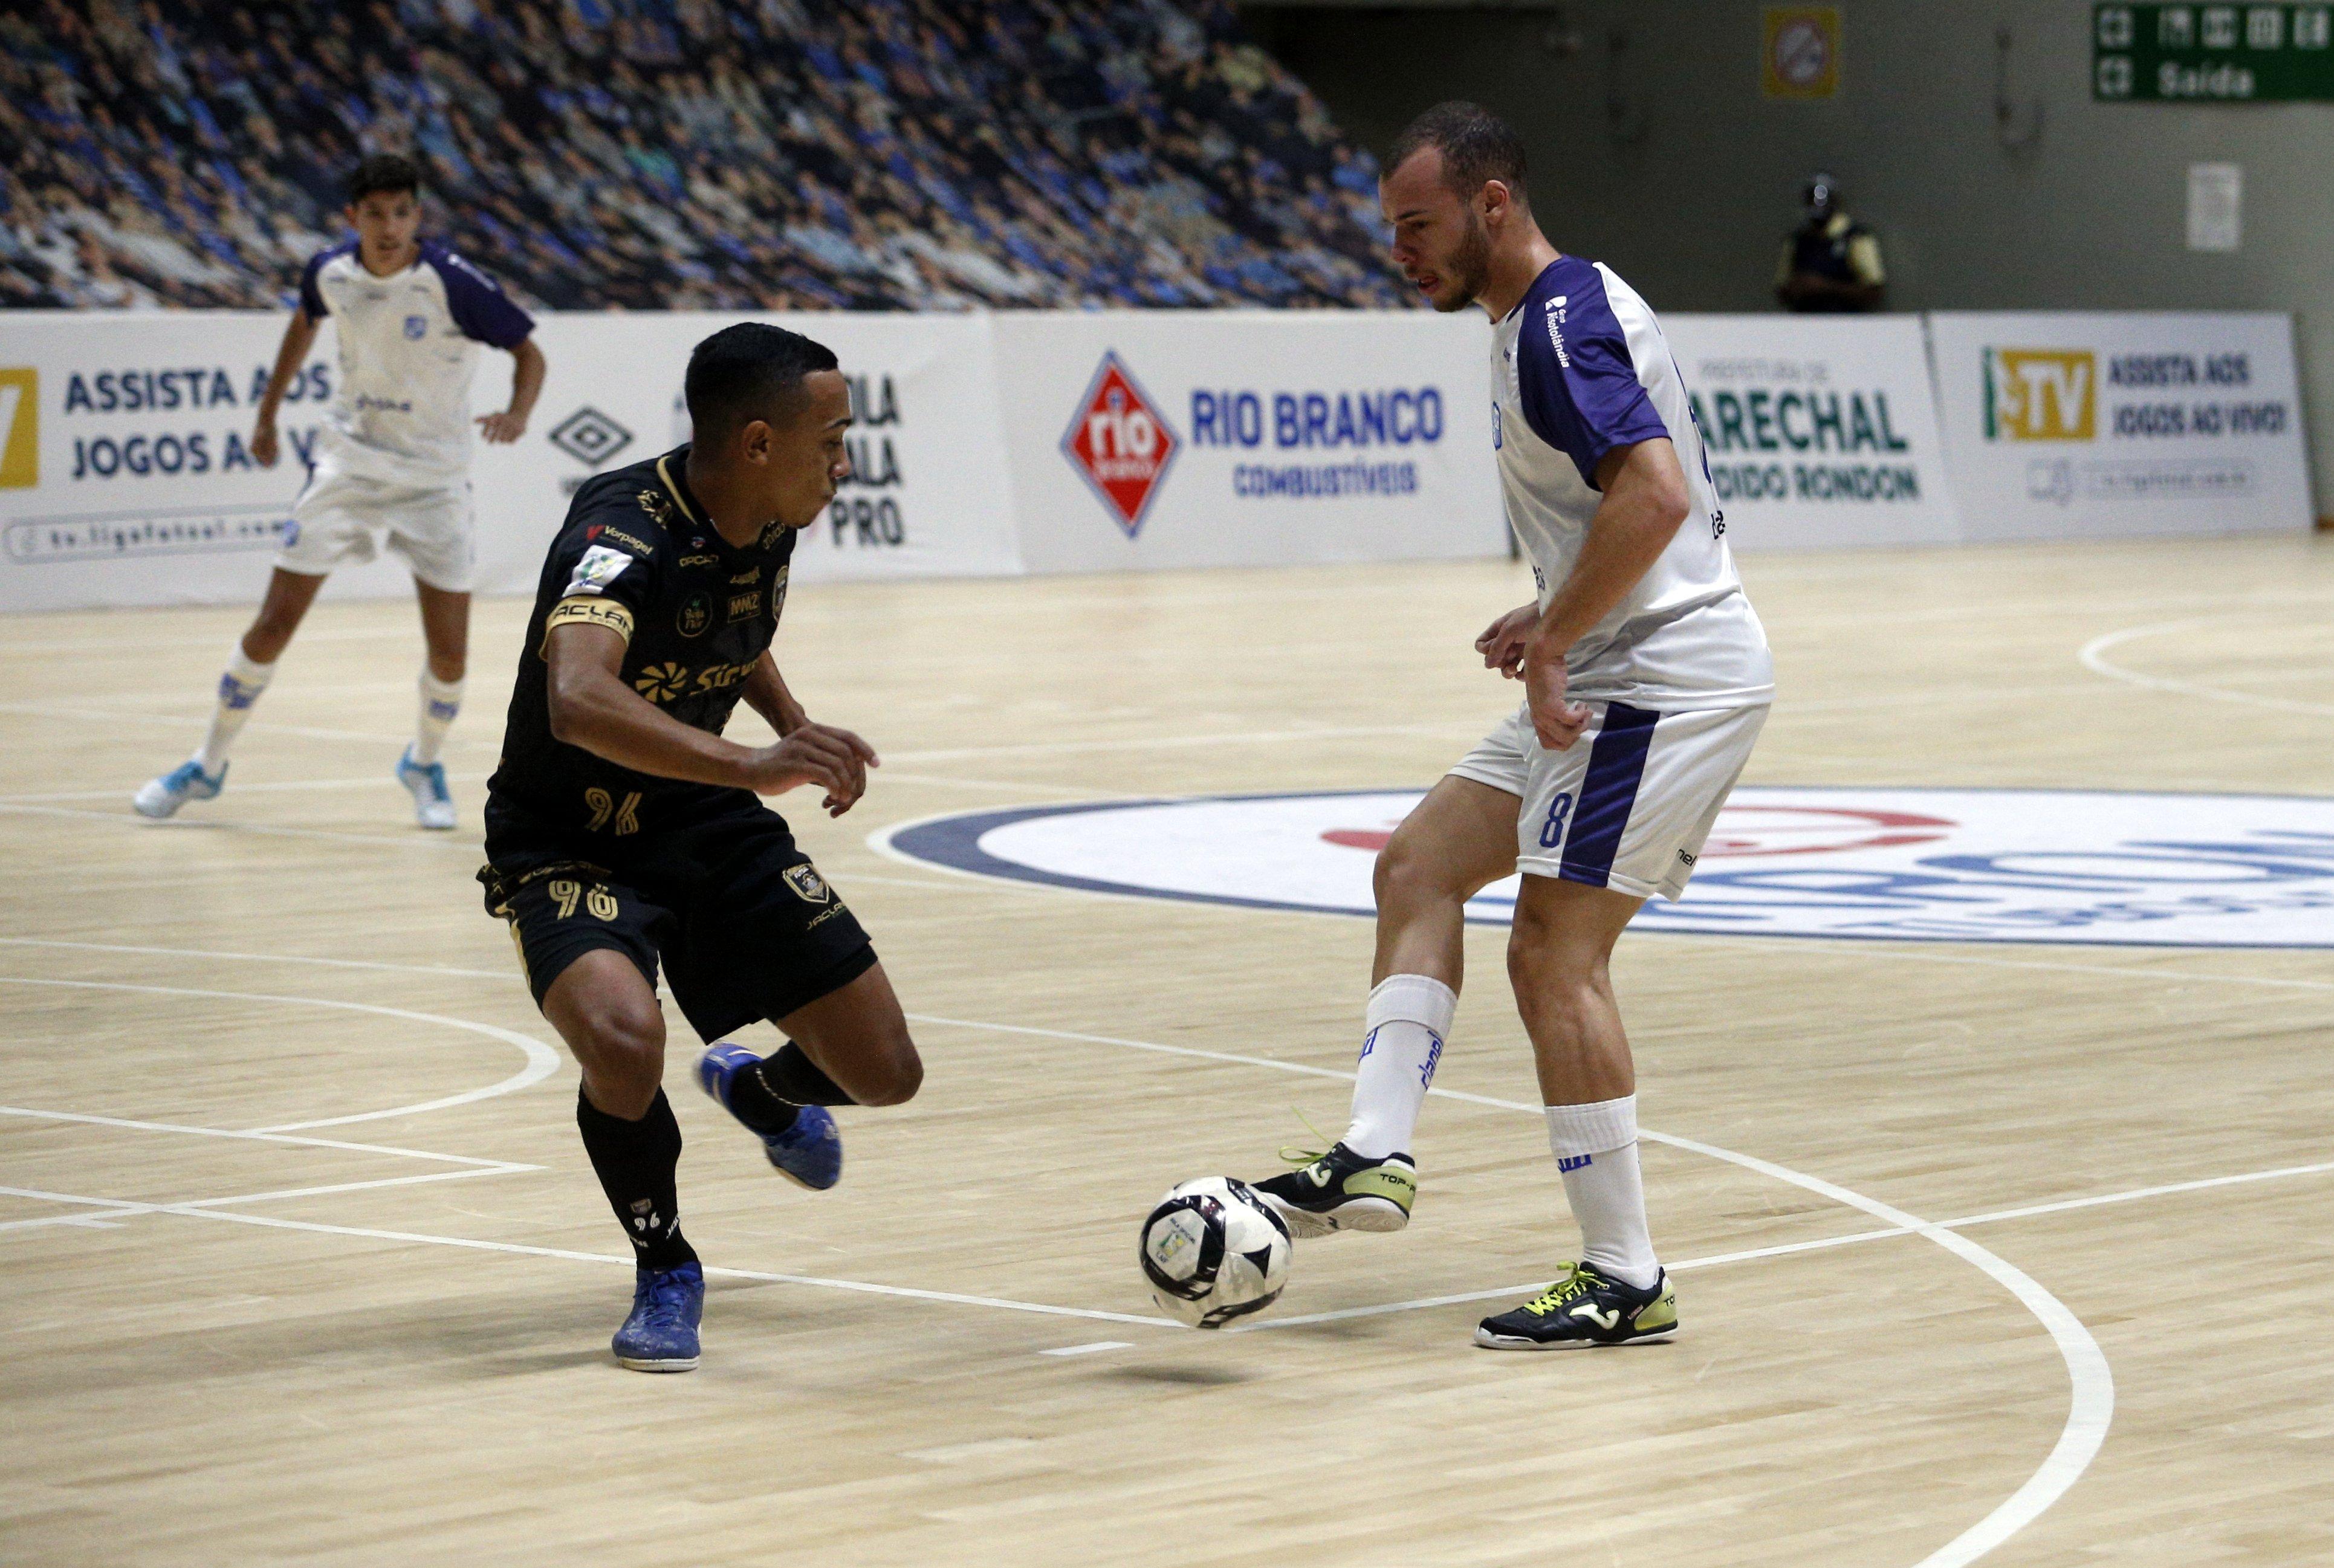 Minas dominou o time paranaense na Arena (Foto: Orlando Bento/Minas Tênis Clube)